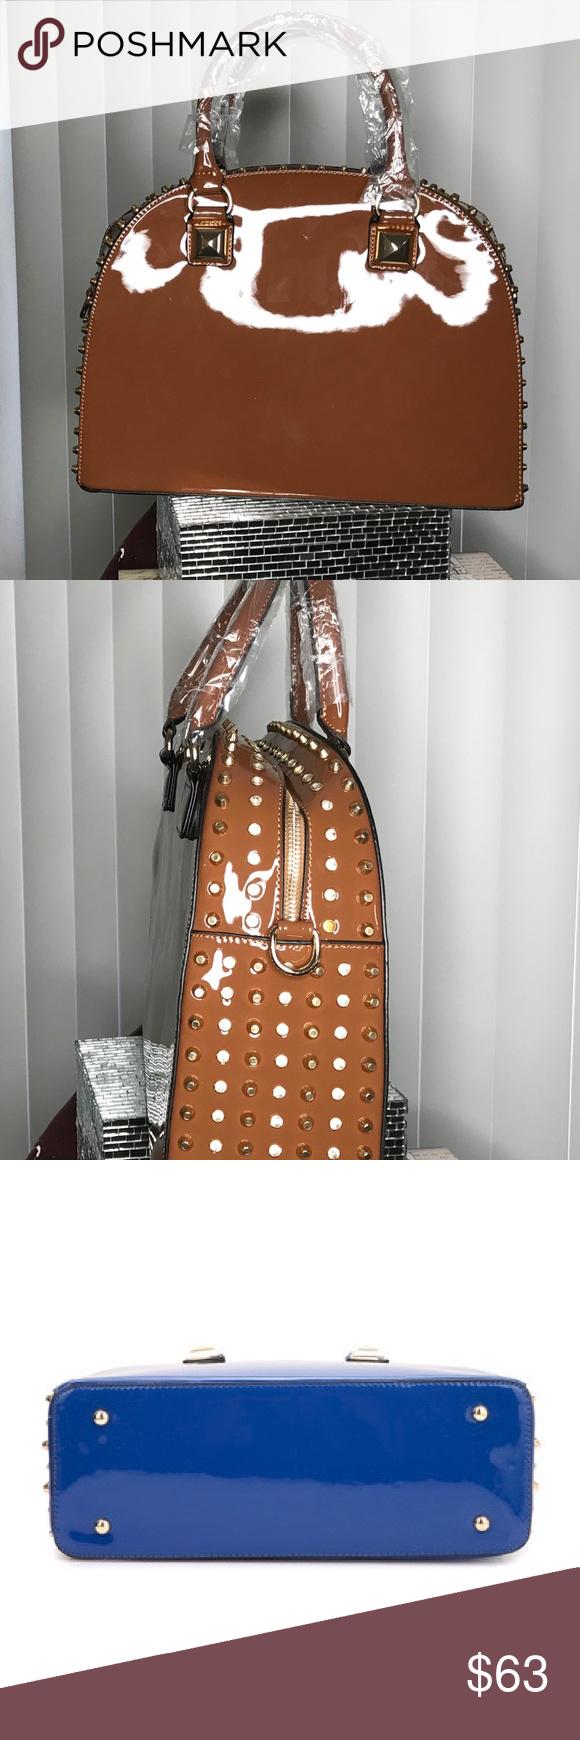 a15d479fe6 Dasein Patent Leather Rhinestone Fashion Handbag 💕💕SUMMER CLOSET MARKDOWN  💕💕 Dome zip around